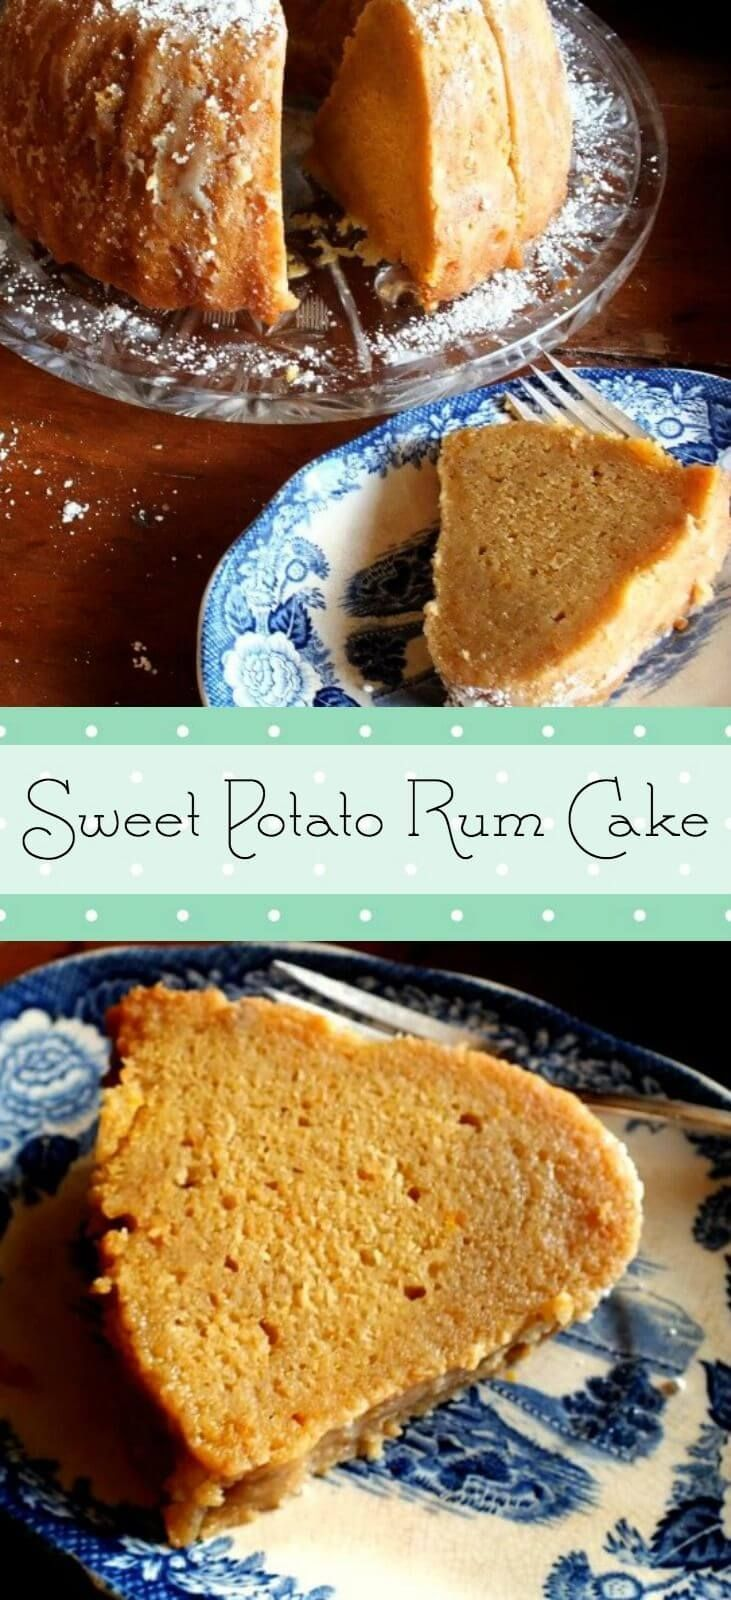 Sweet Potato Cake Recipe From Scratch